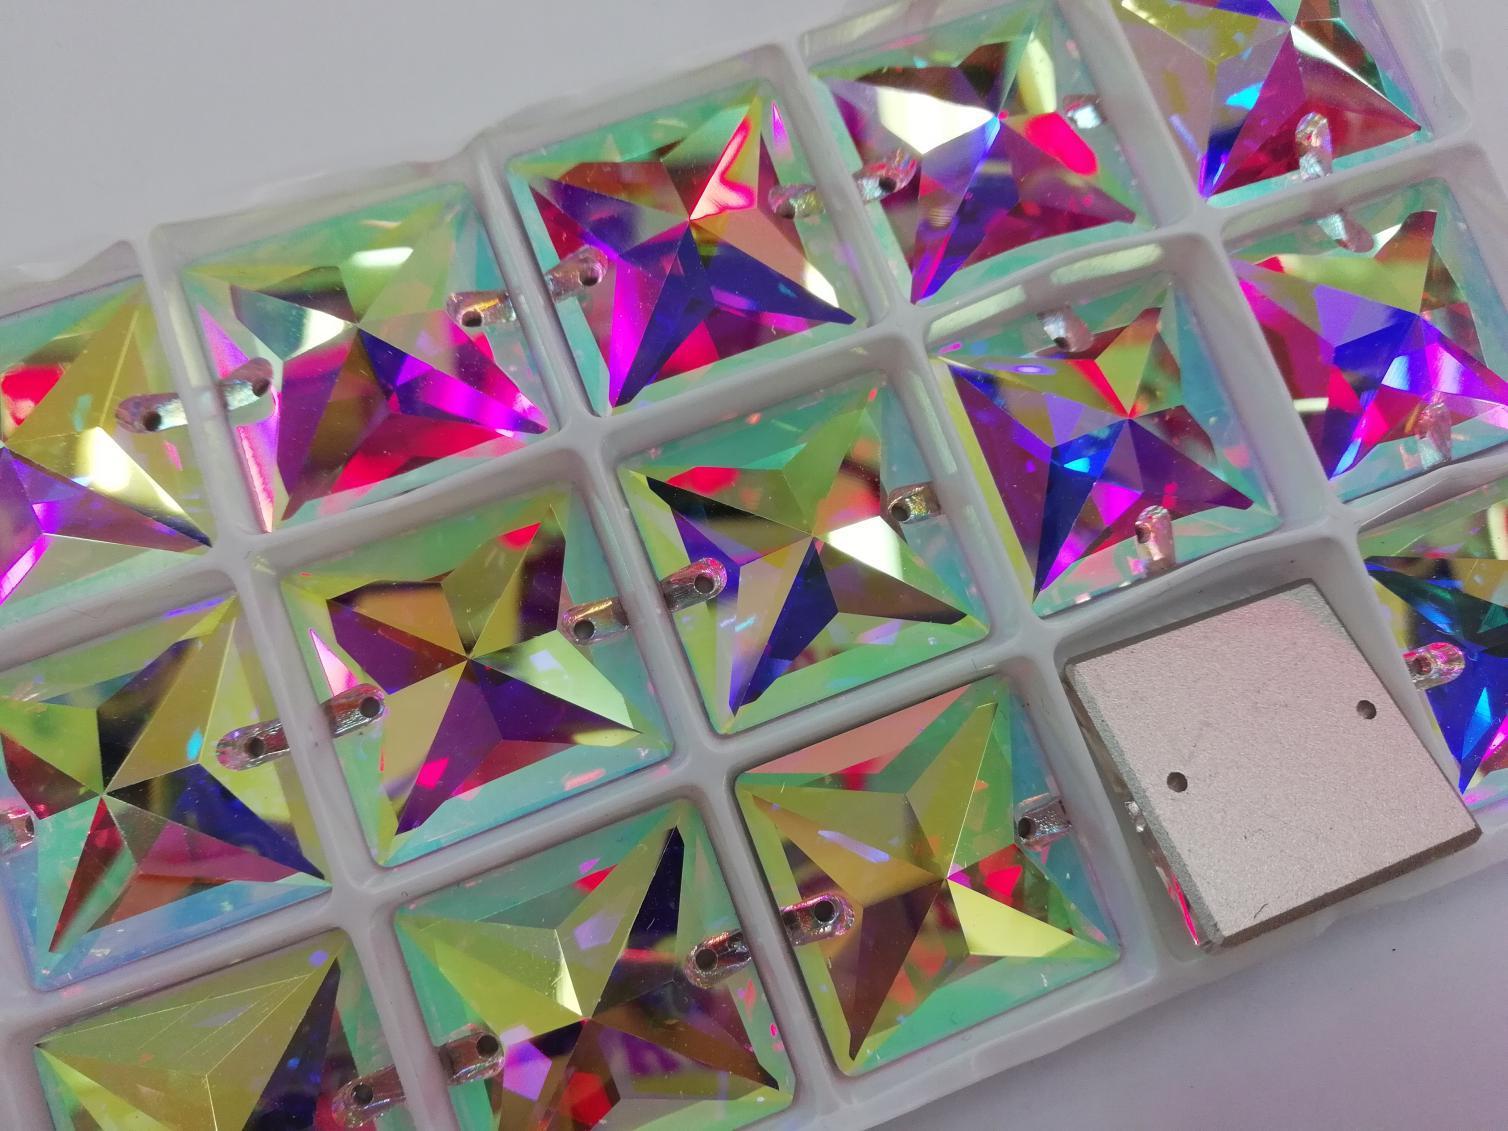 Jpstrass-High-quality Jpstrass Flat Back Sew On Crystal Glass Beads Teardrop-4